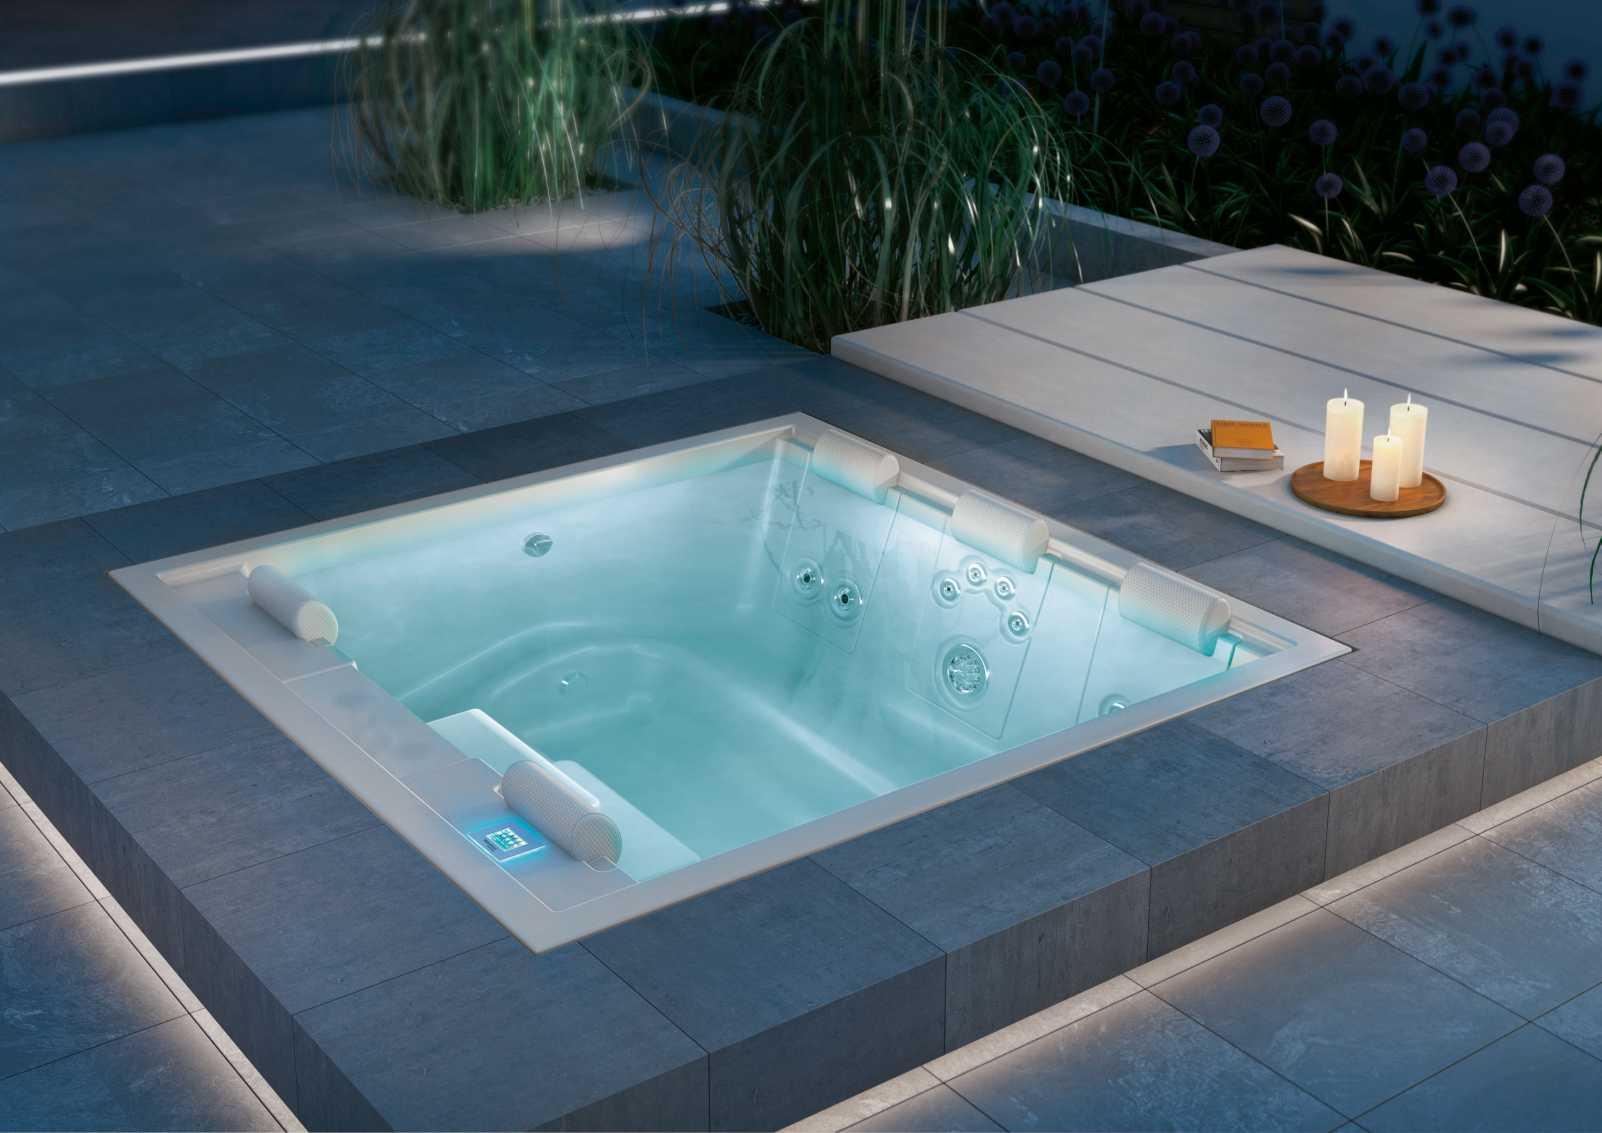 Whirlpool ac schwimmbadtechnik - Outdoor whirlpool ...